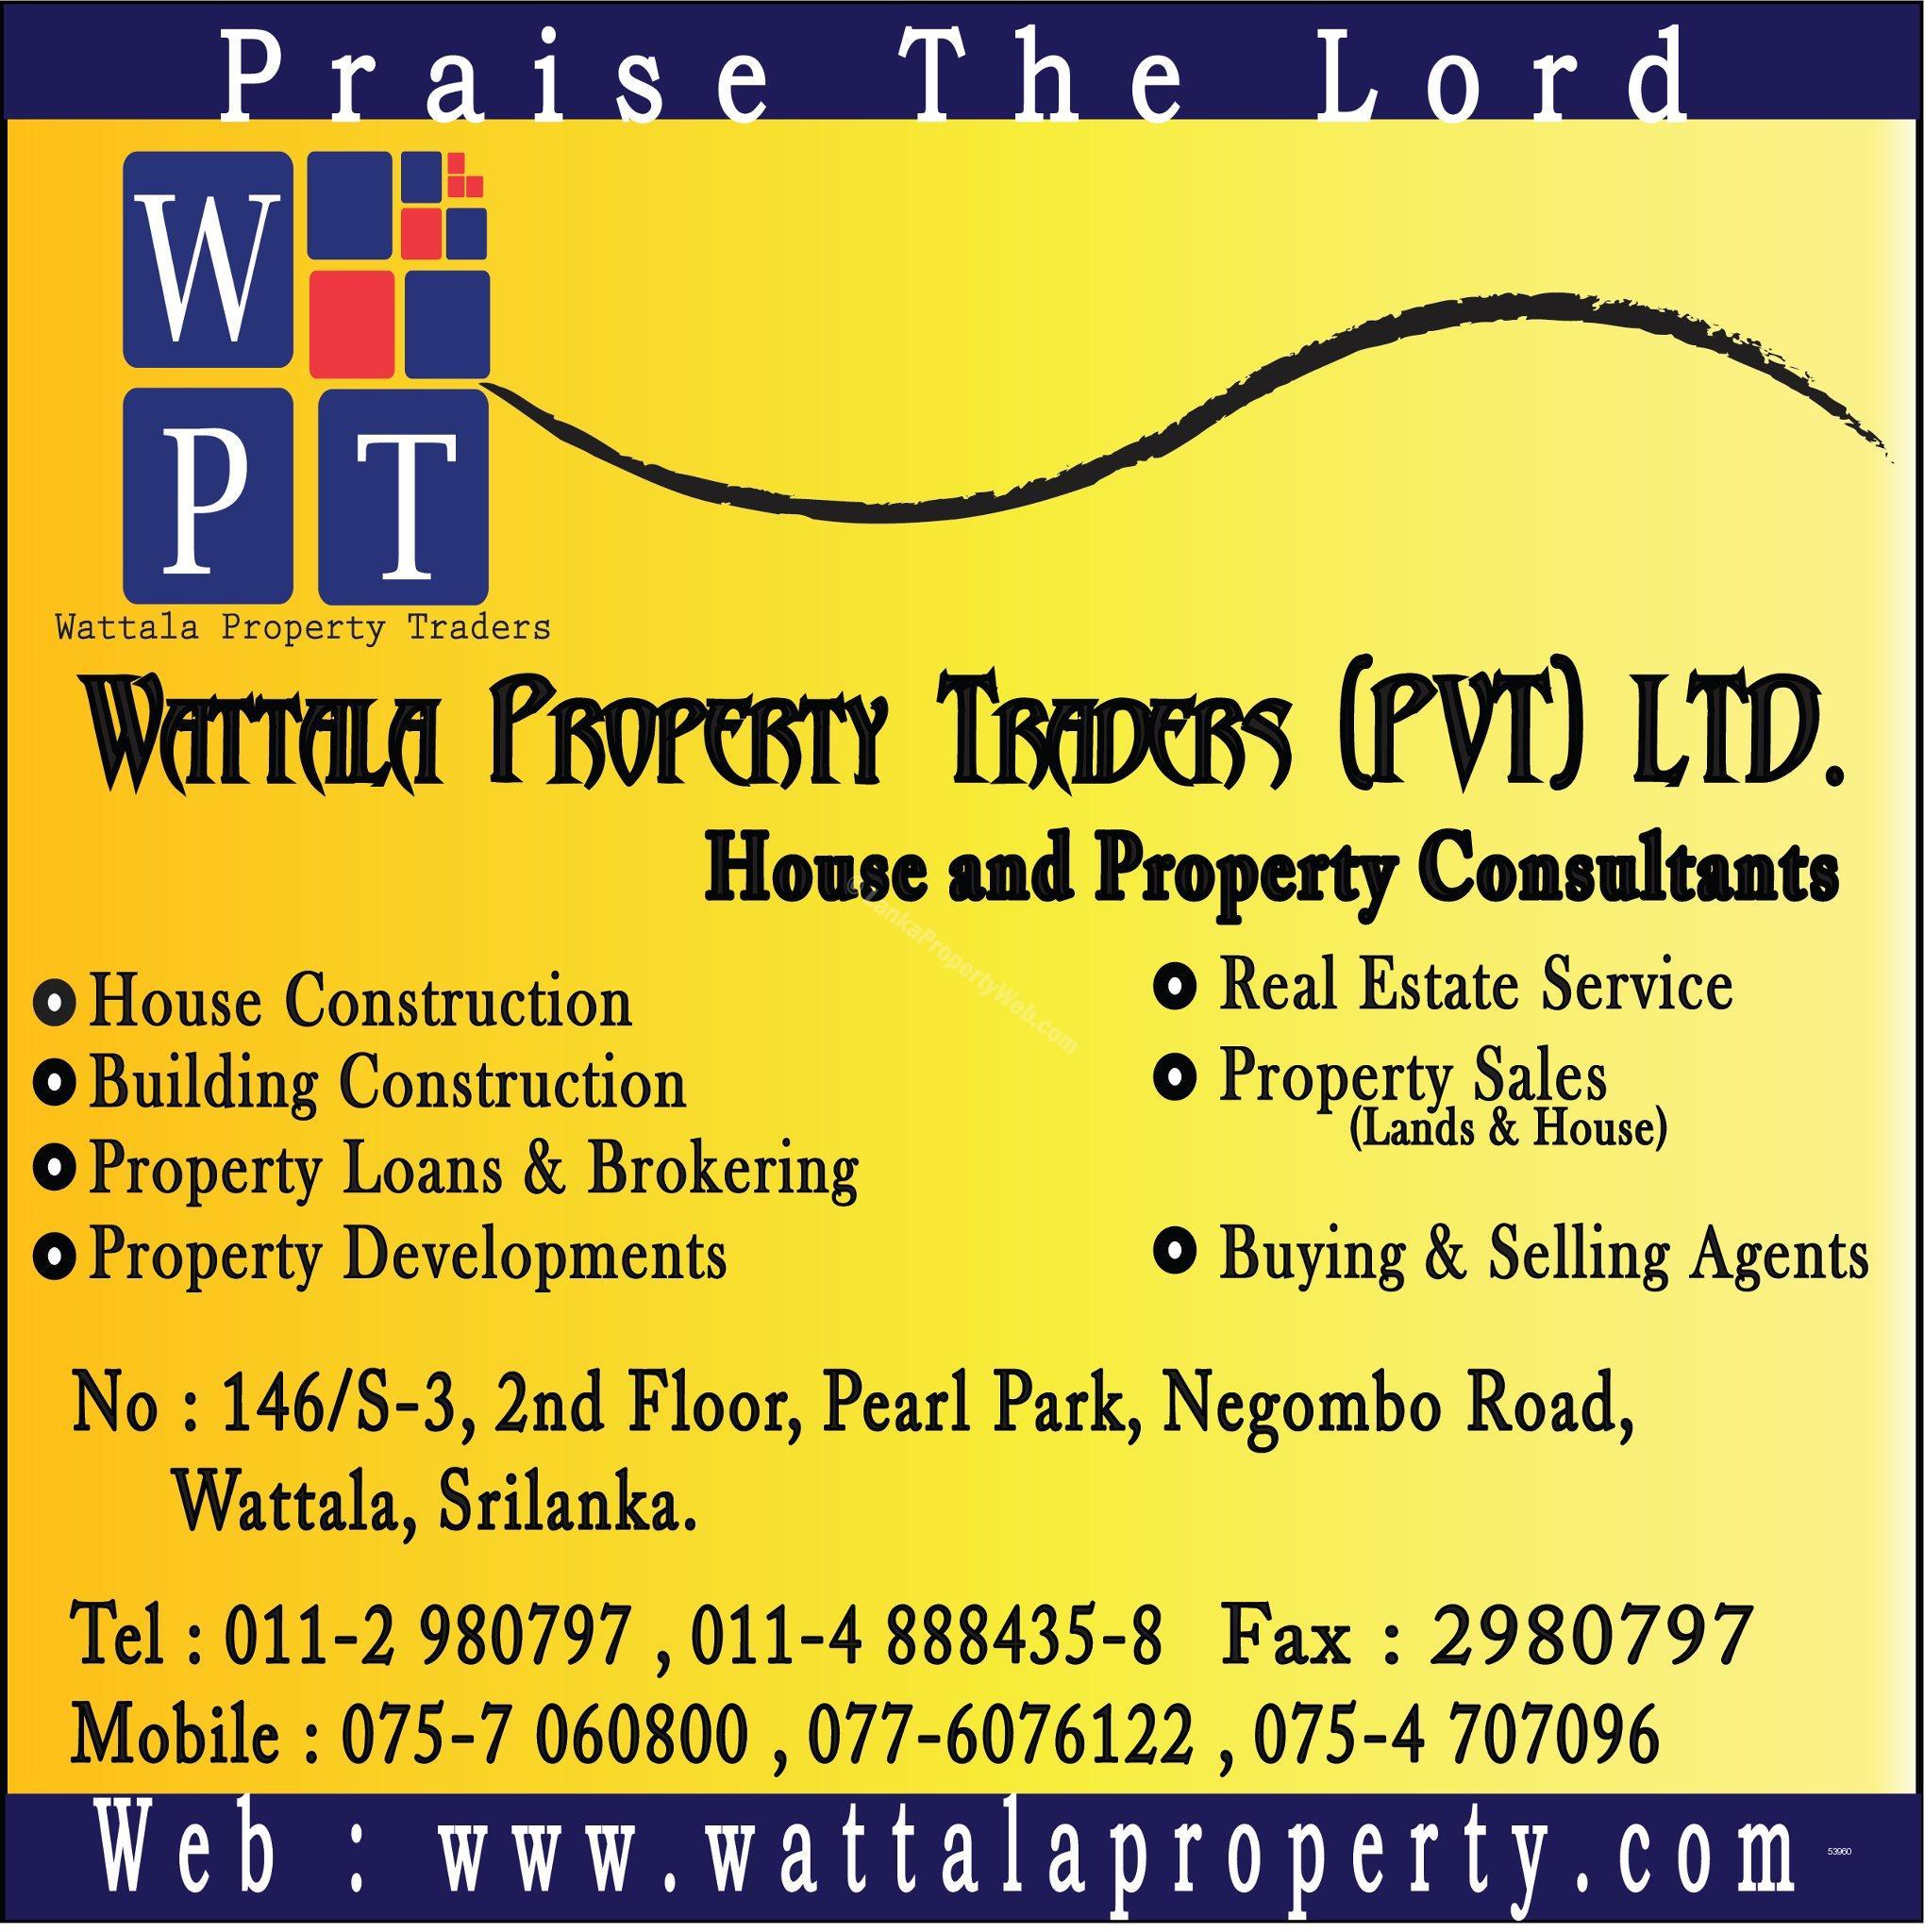 Wattala Property Traders